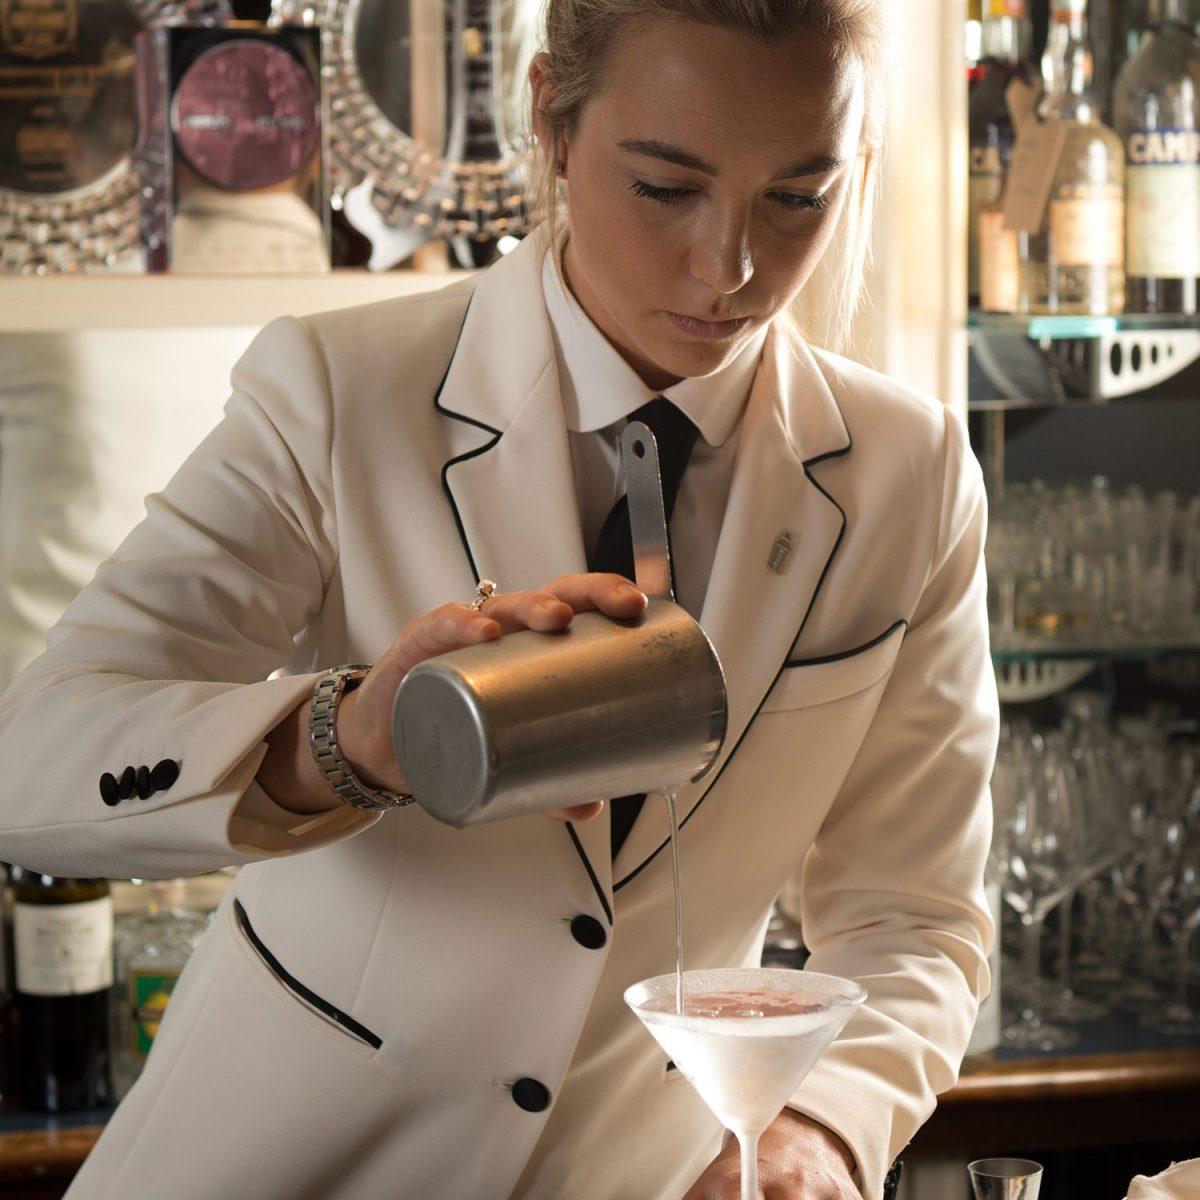 Mixologist at The Savoy